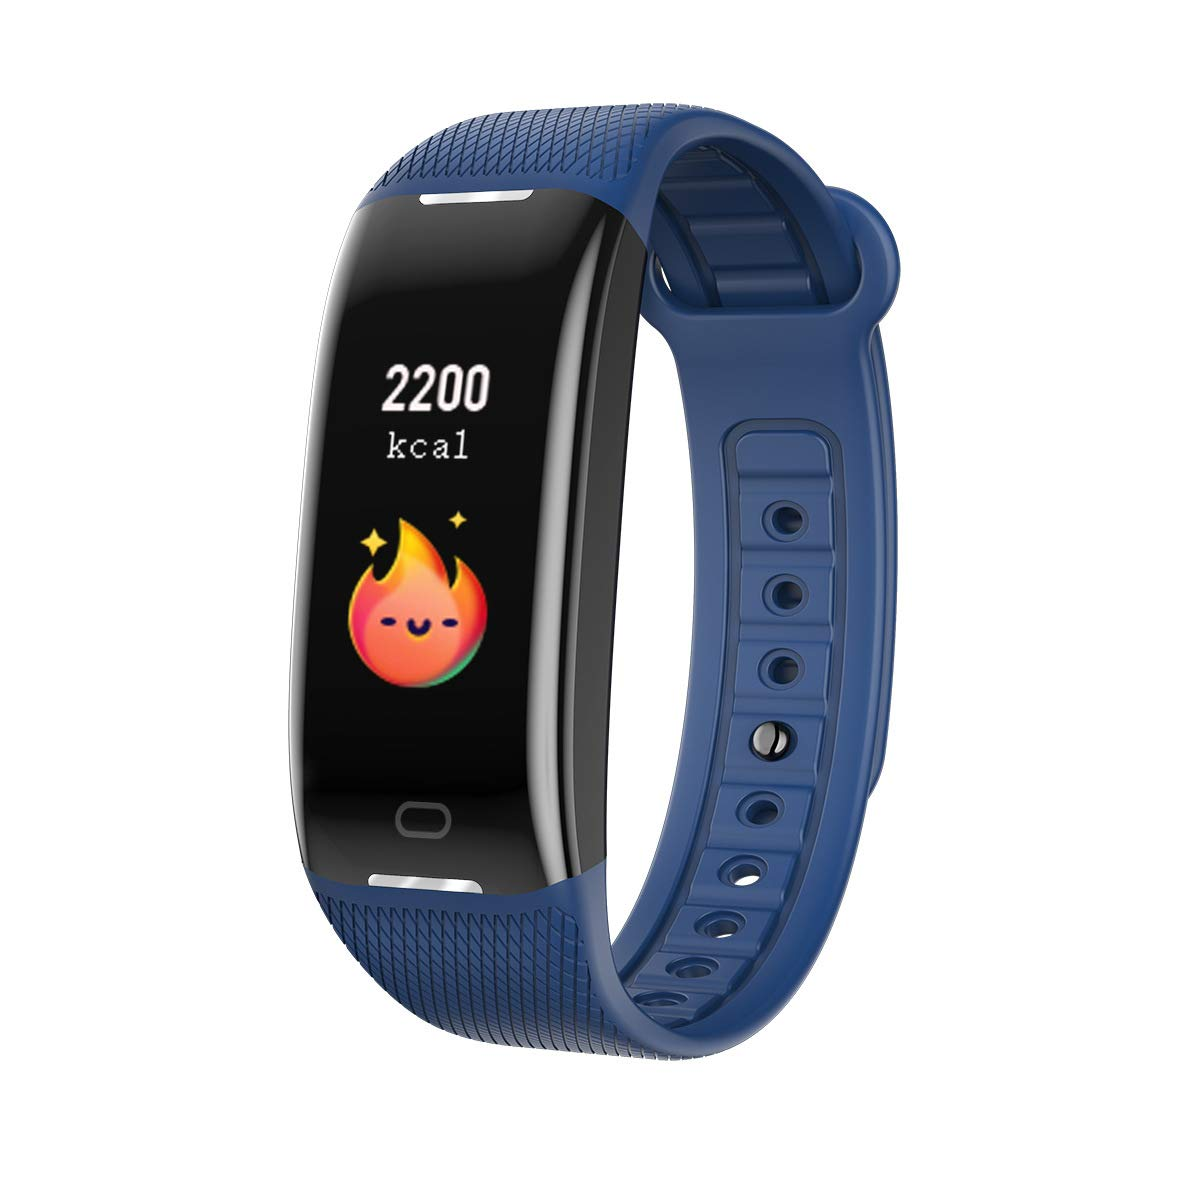 WLLIT Smart Sports Watch/Smart Bracelet,Smart Sports Watch, Blood Pressure Heart Rate Sleep Step Monitoring, Waterproof Bluetooth Health Sports Bracelet-Blue by WLLIT